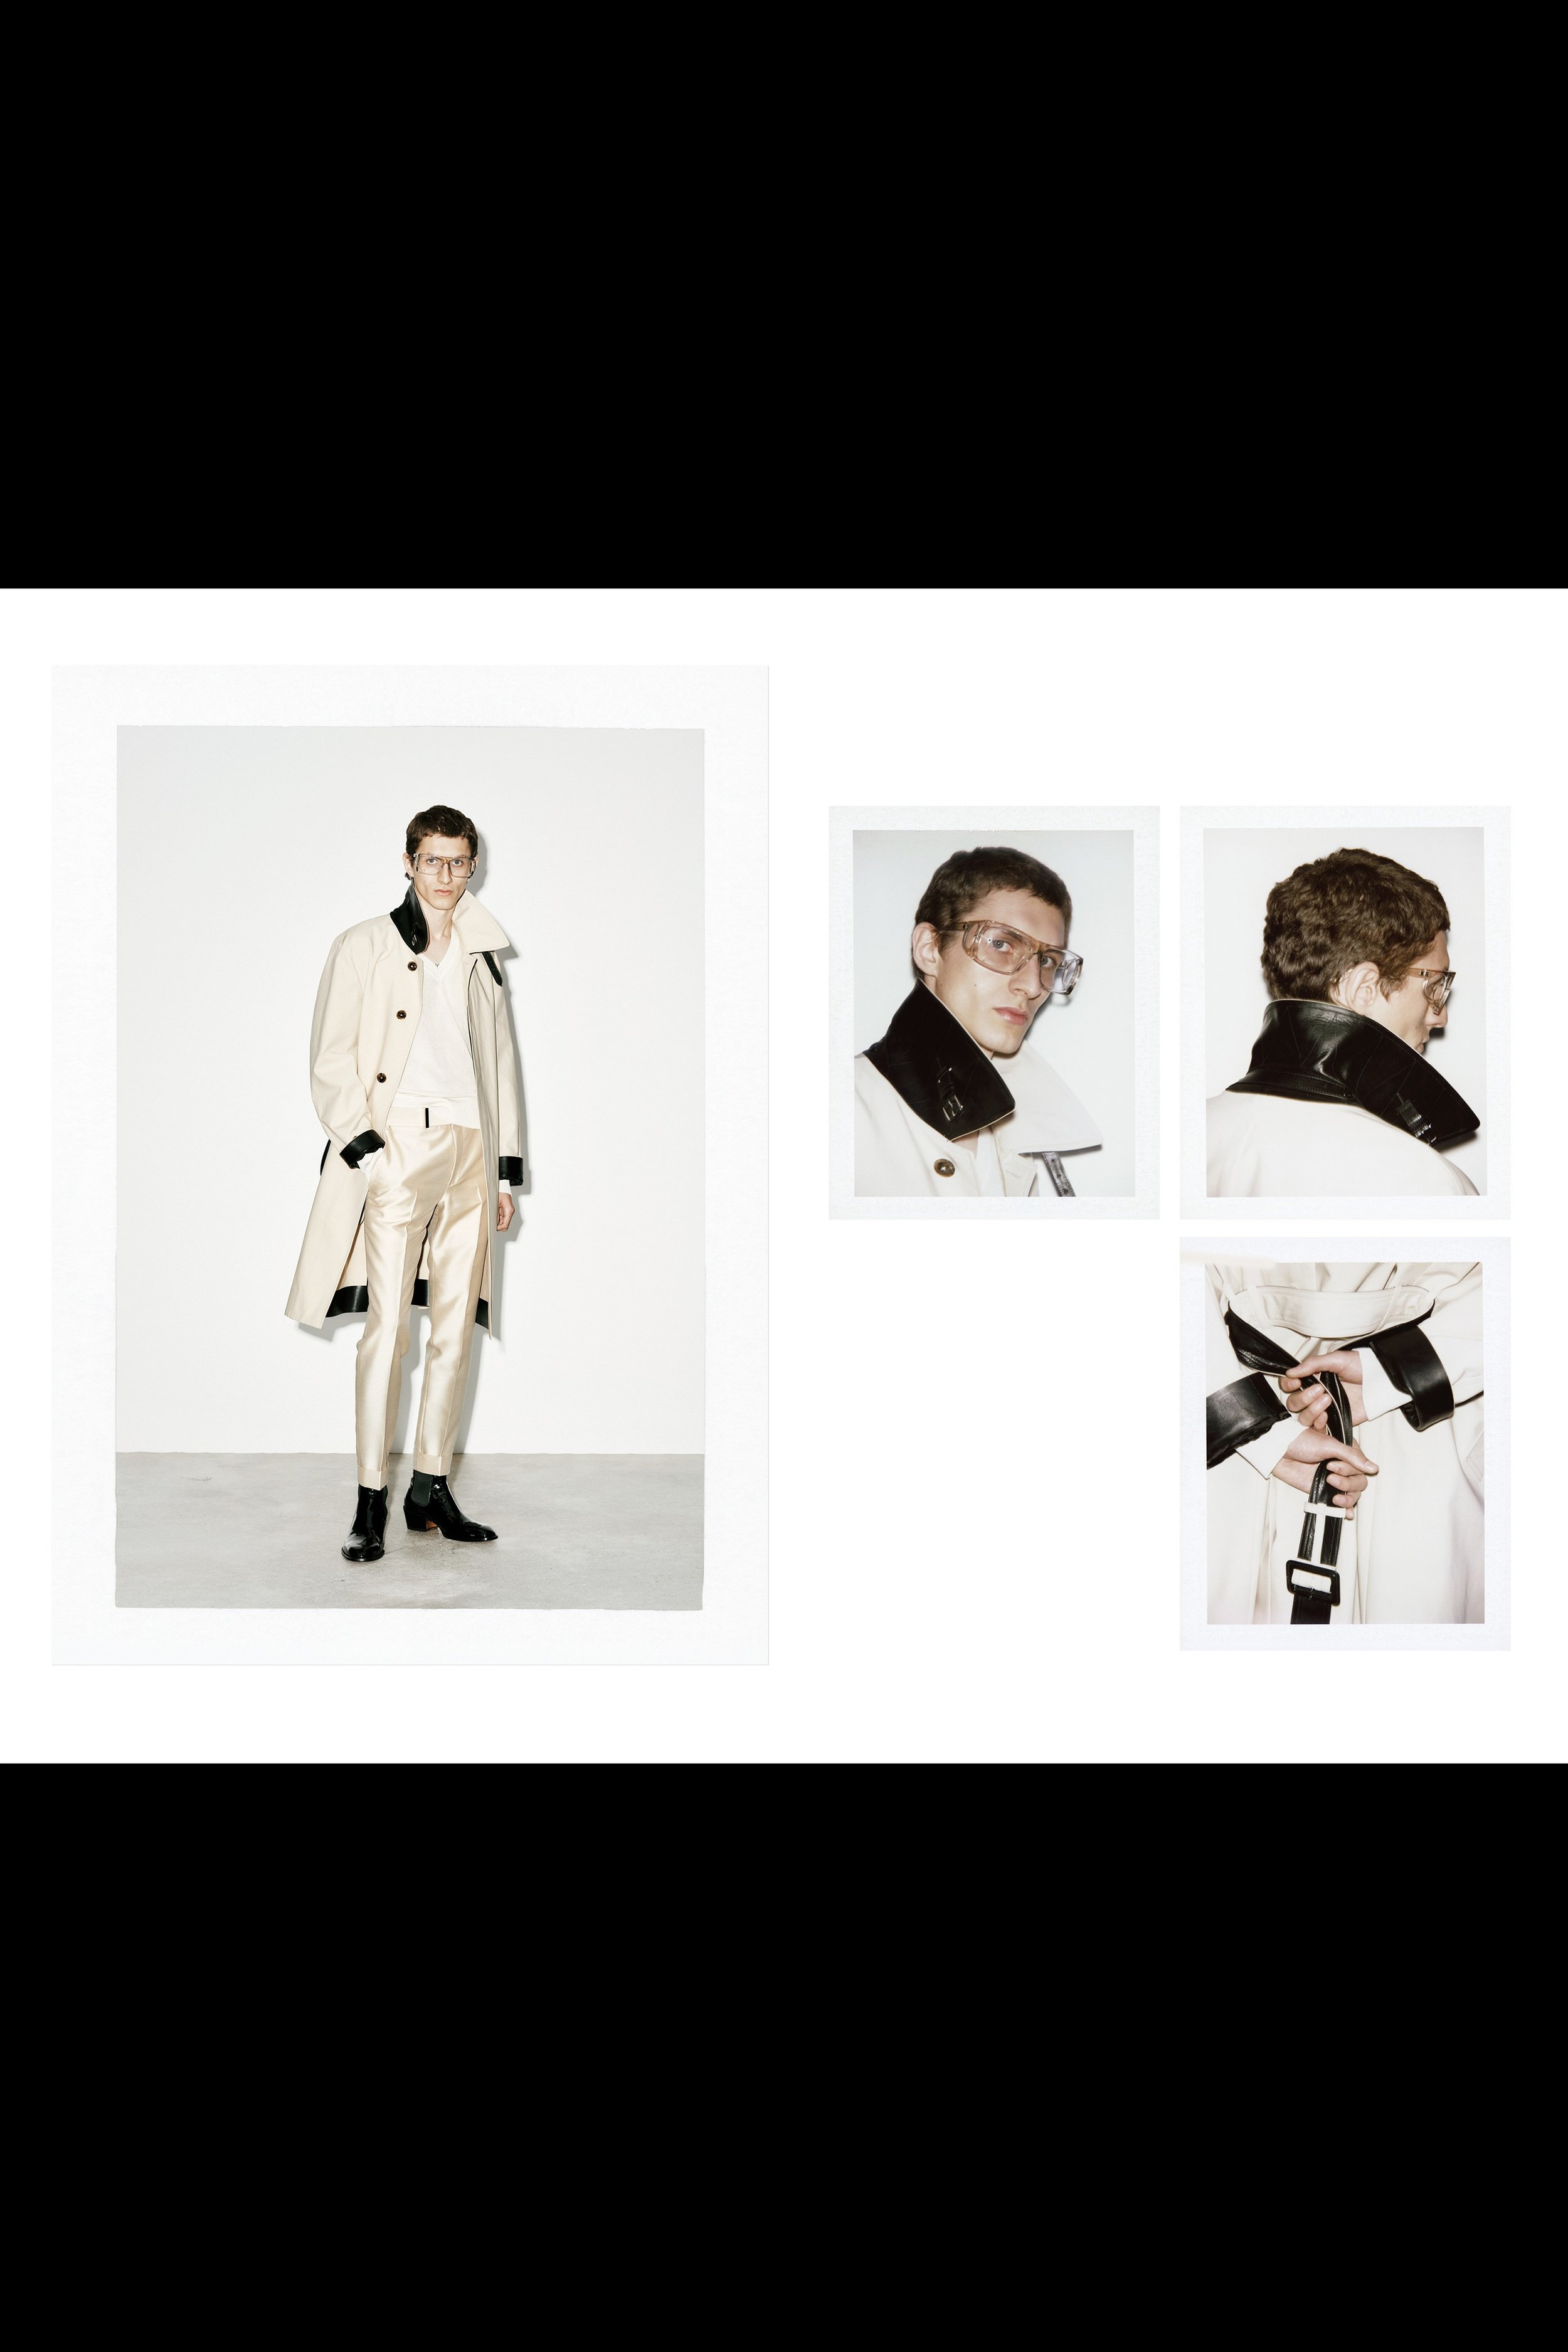 00012-Tom-Ford-vogue-menswear-spring-2019-pr.jpg